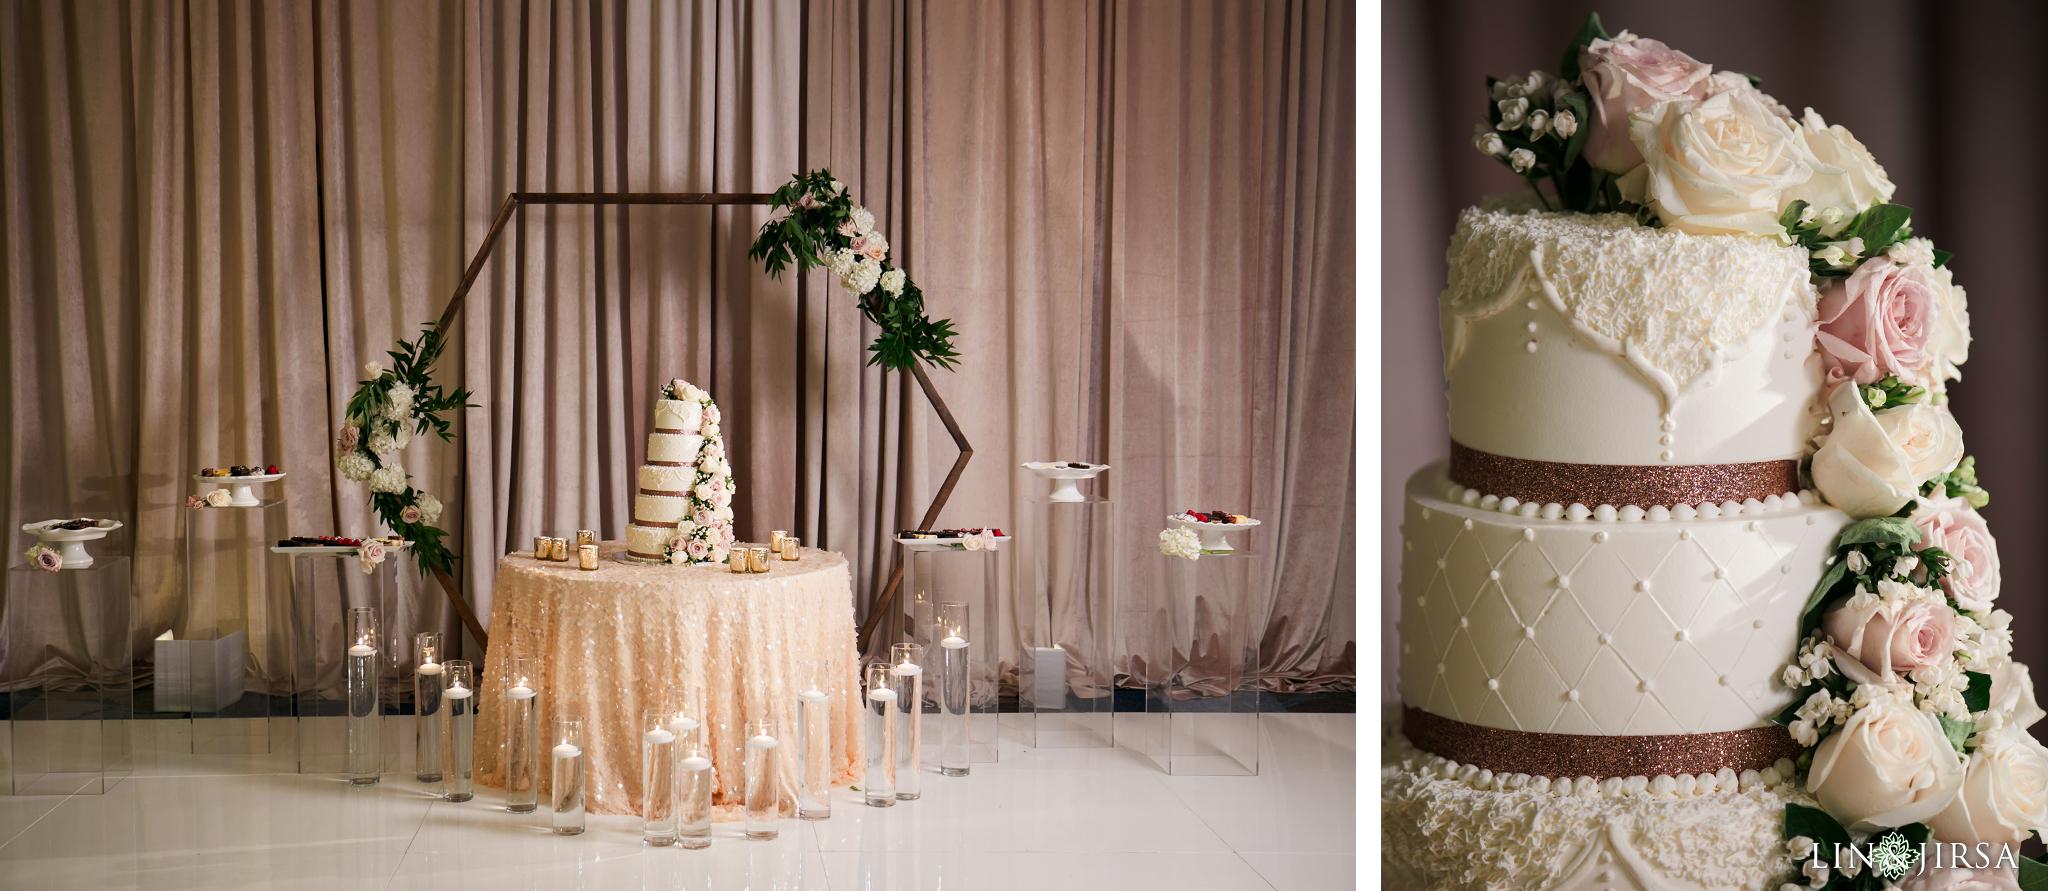 23 The Newport Beach Marriott Hotel Wedding Photography